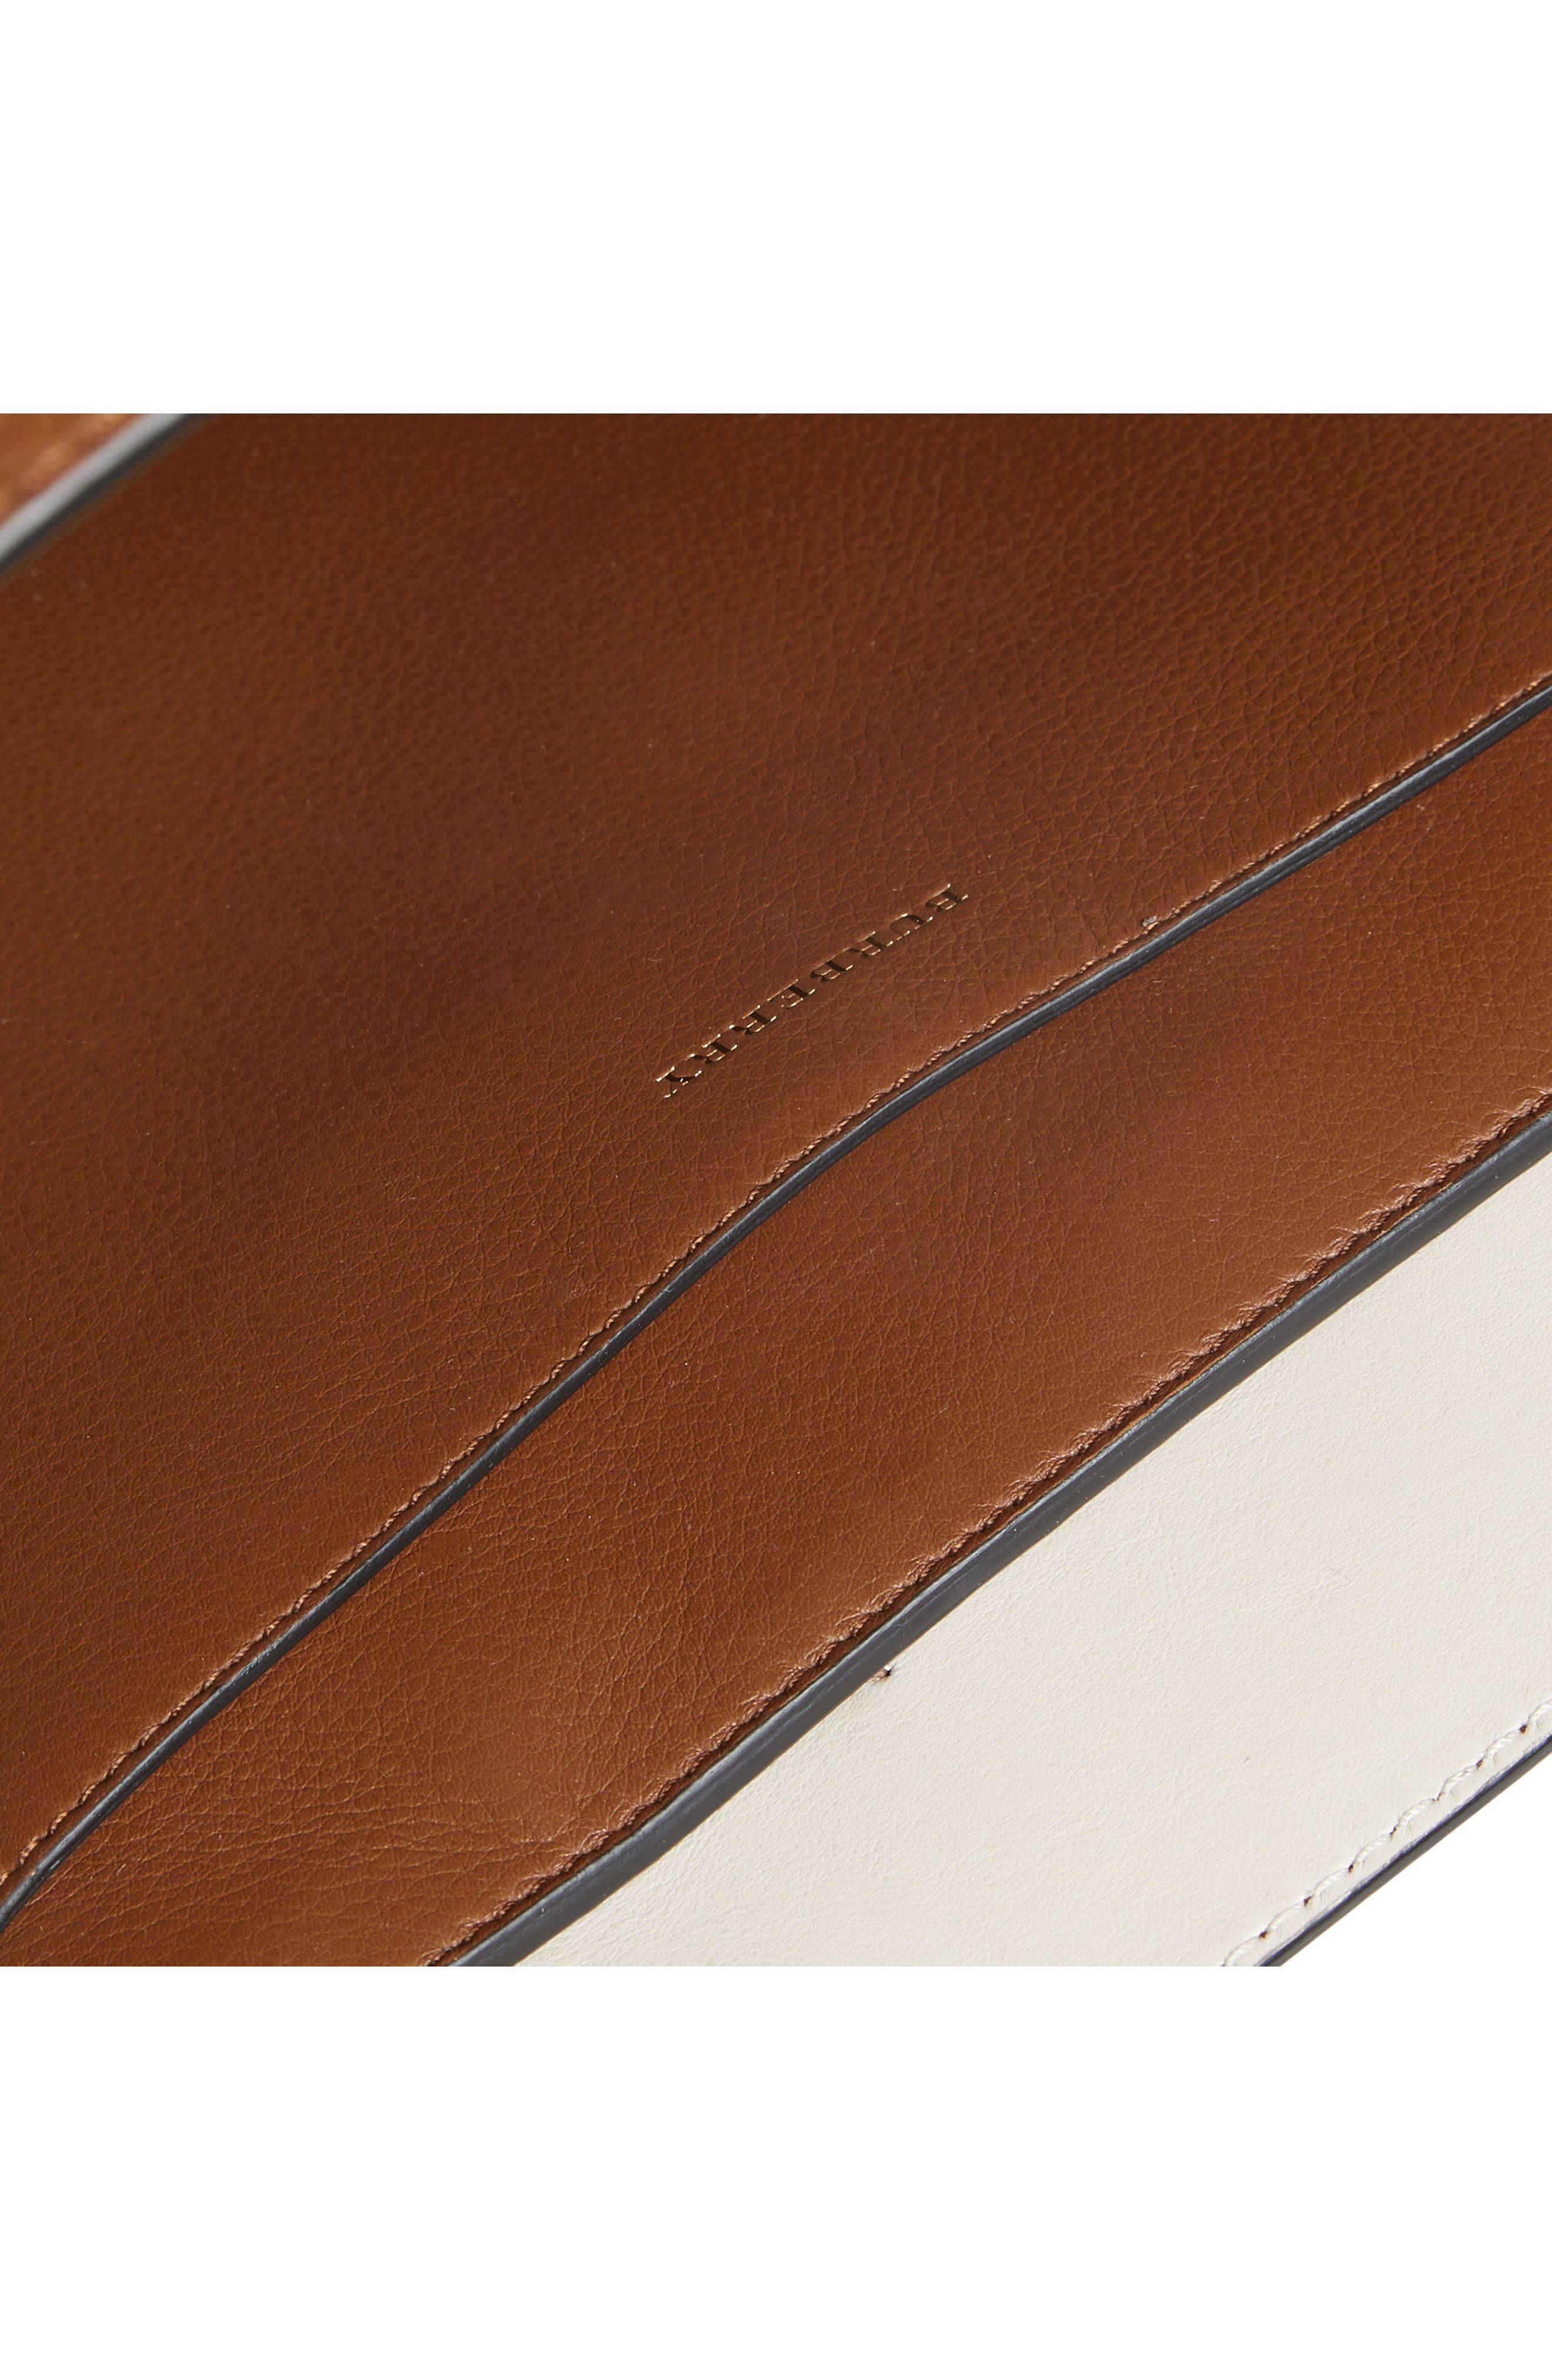 Medium Belt Bag Leather Tote,                             Alternate thumbnail 4, color,                             216